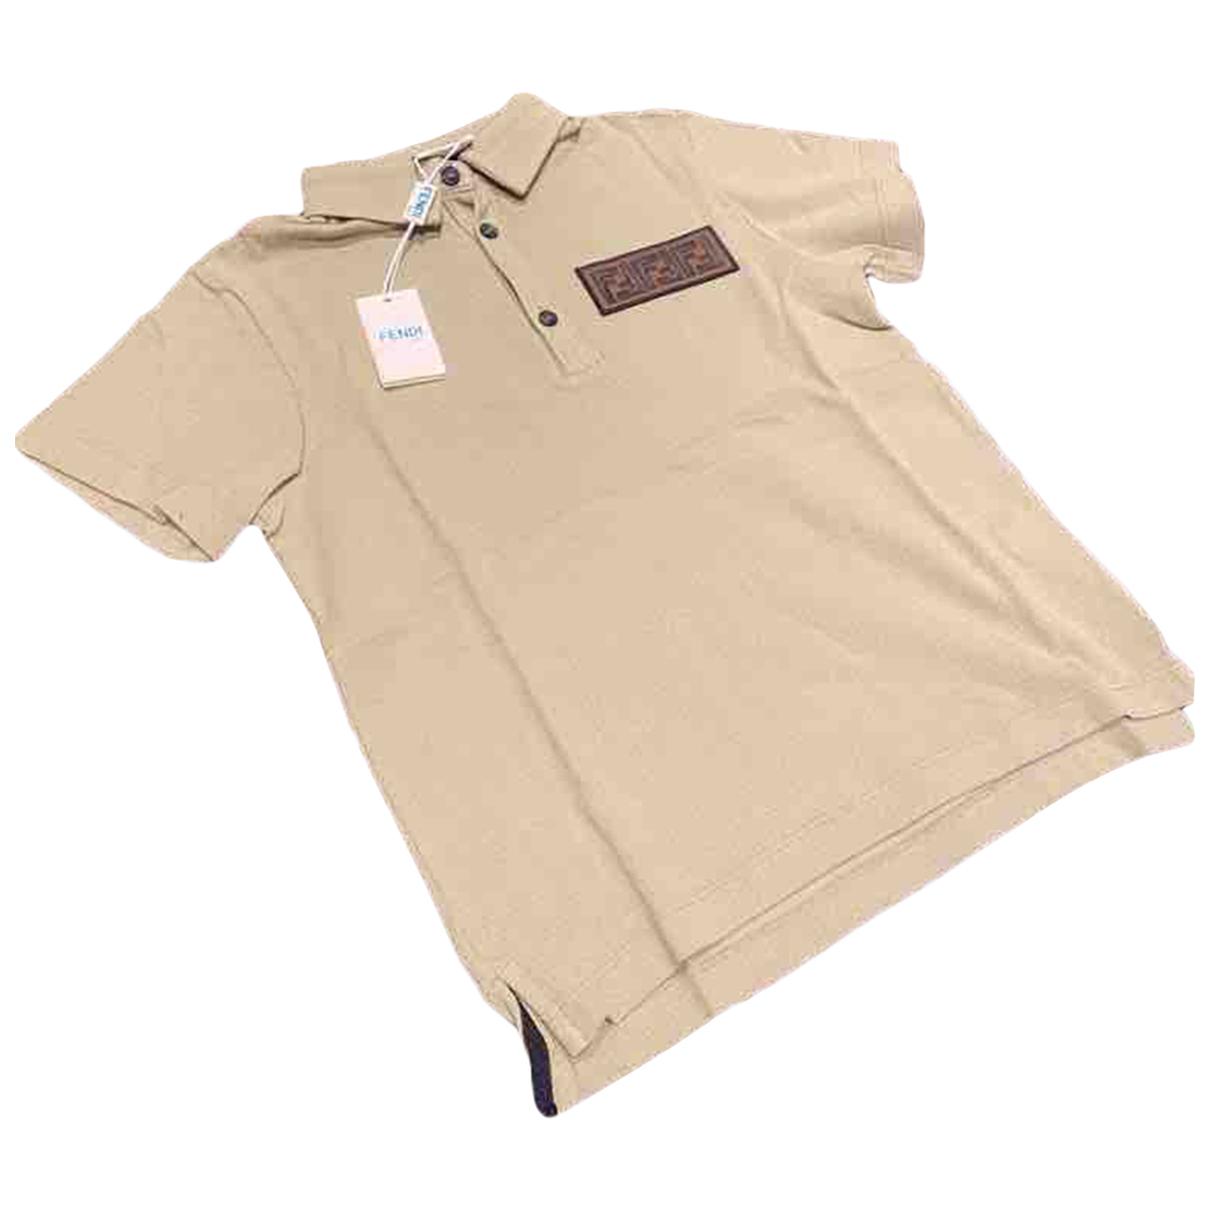 Fendi - Top   pour enfant en coton - kaki